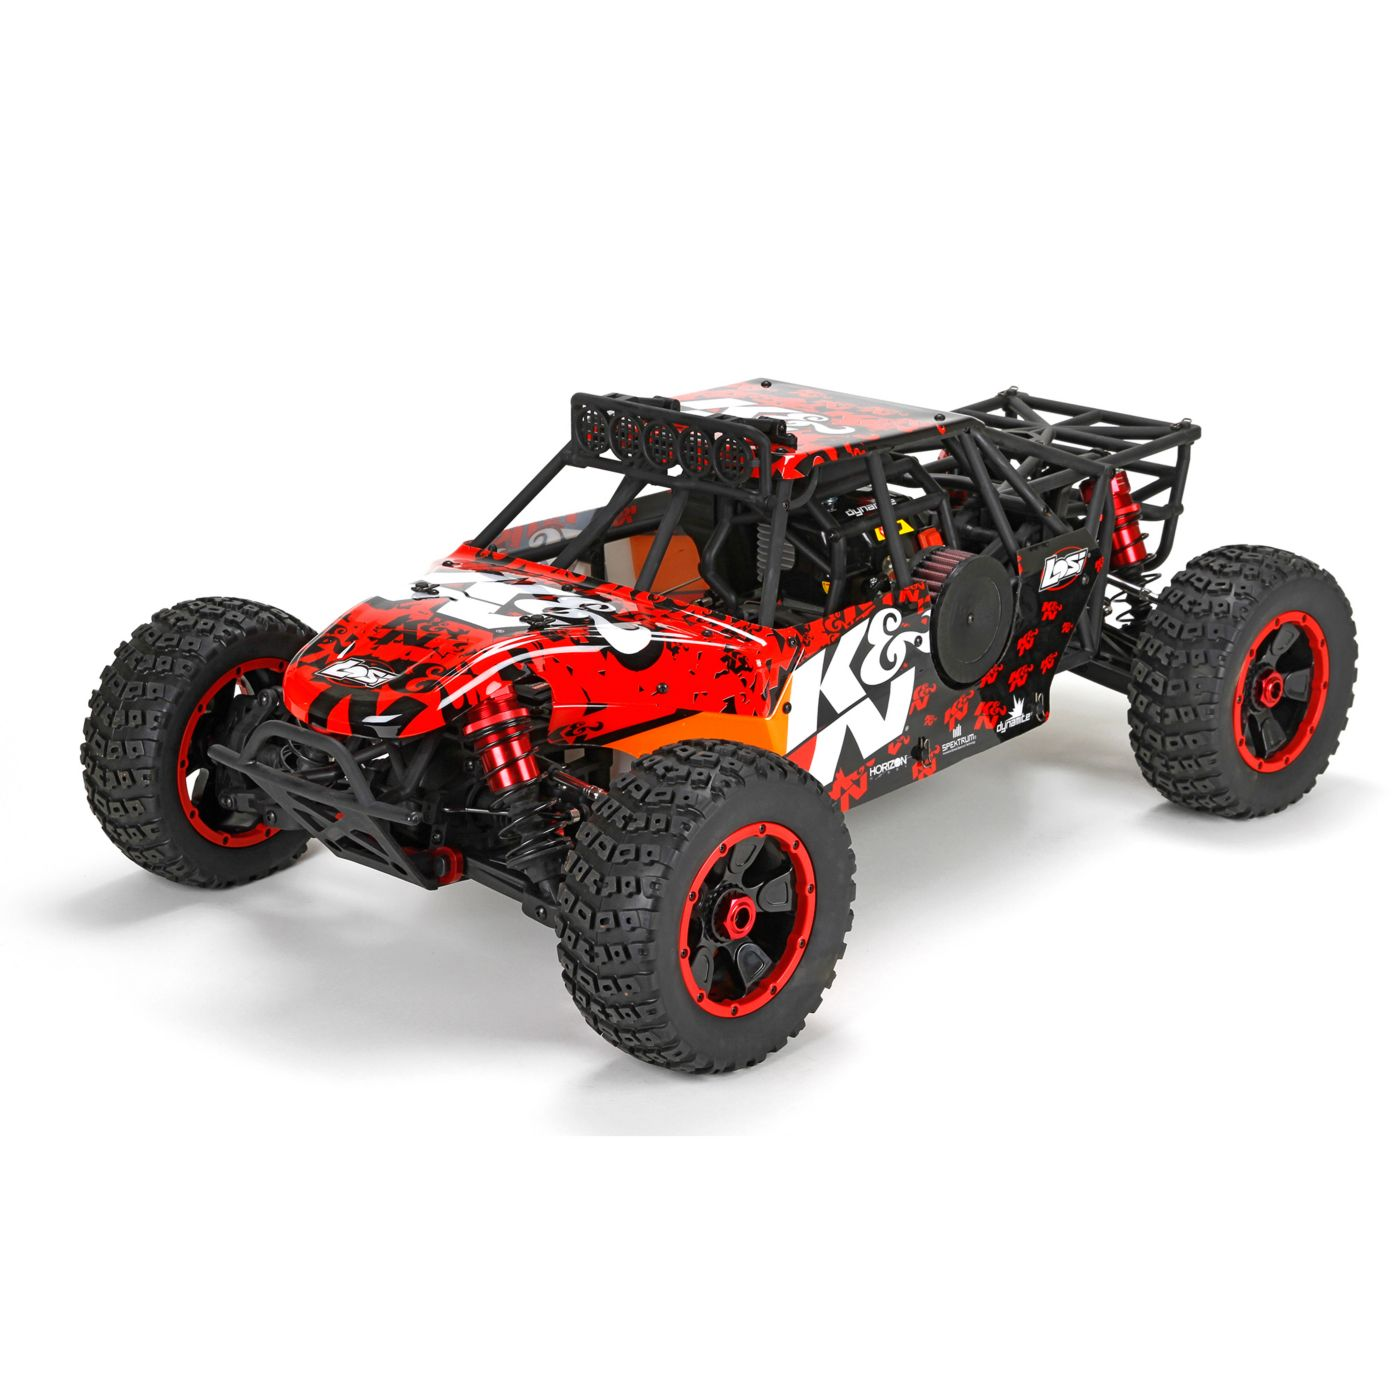 Team Losi Радиоуправляемая машина Багги 1/5 4x4 - Desert Buggy XL K&H Бензин RTR